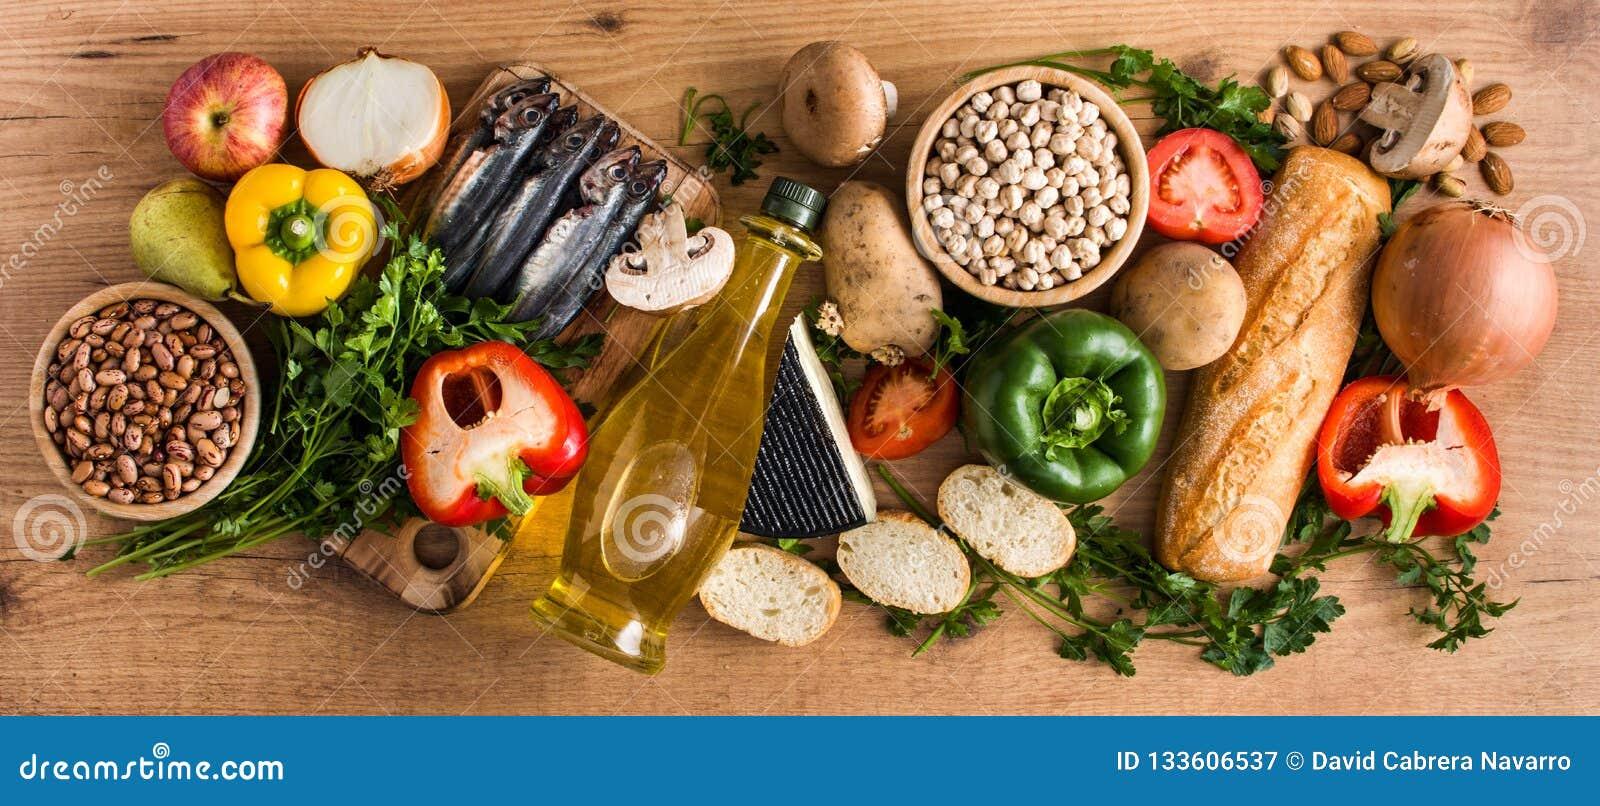 Healthy eating. Mediterranean diet. Fruit,vegetables, grain, nuts olive oil and fish on wood